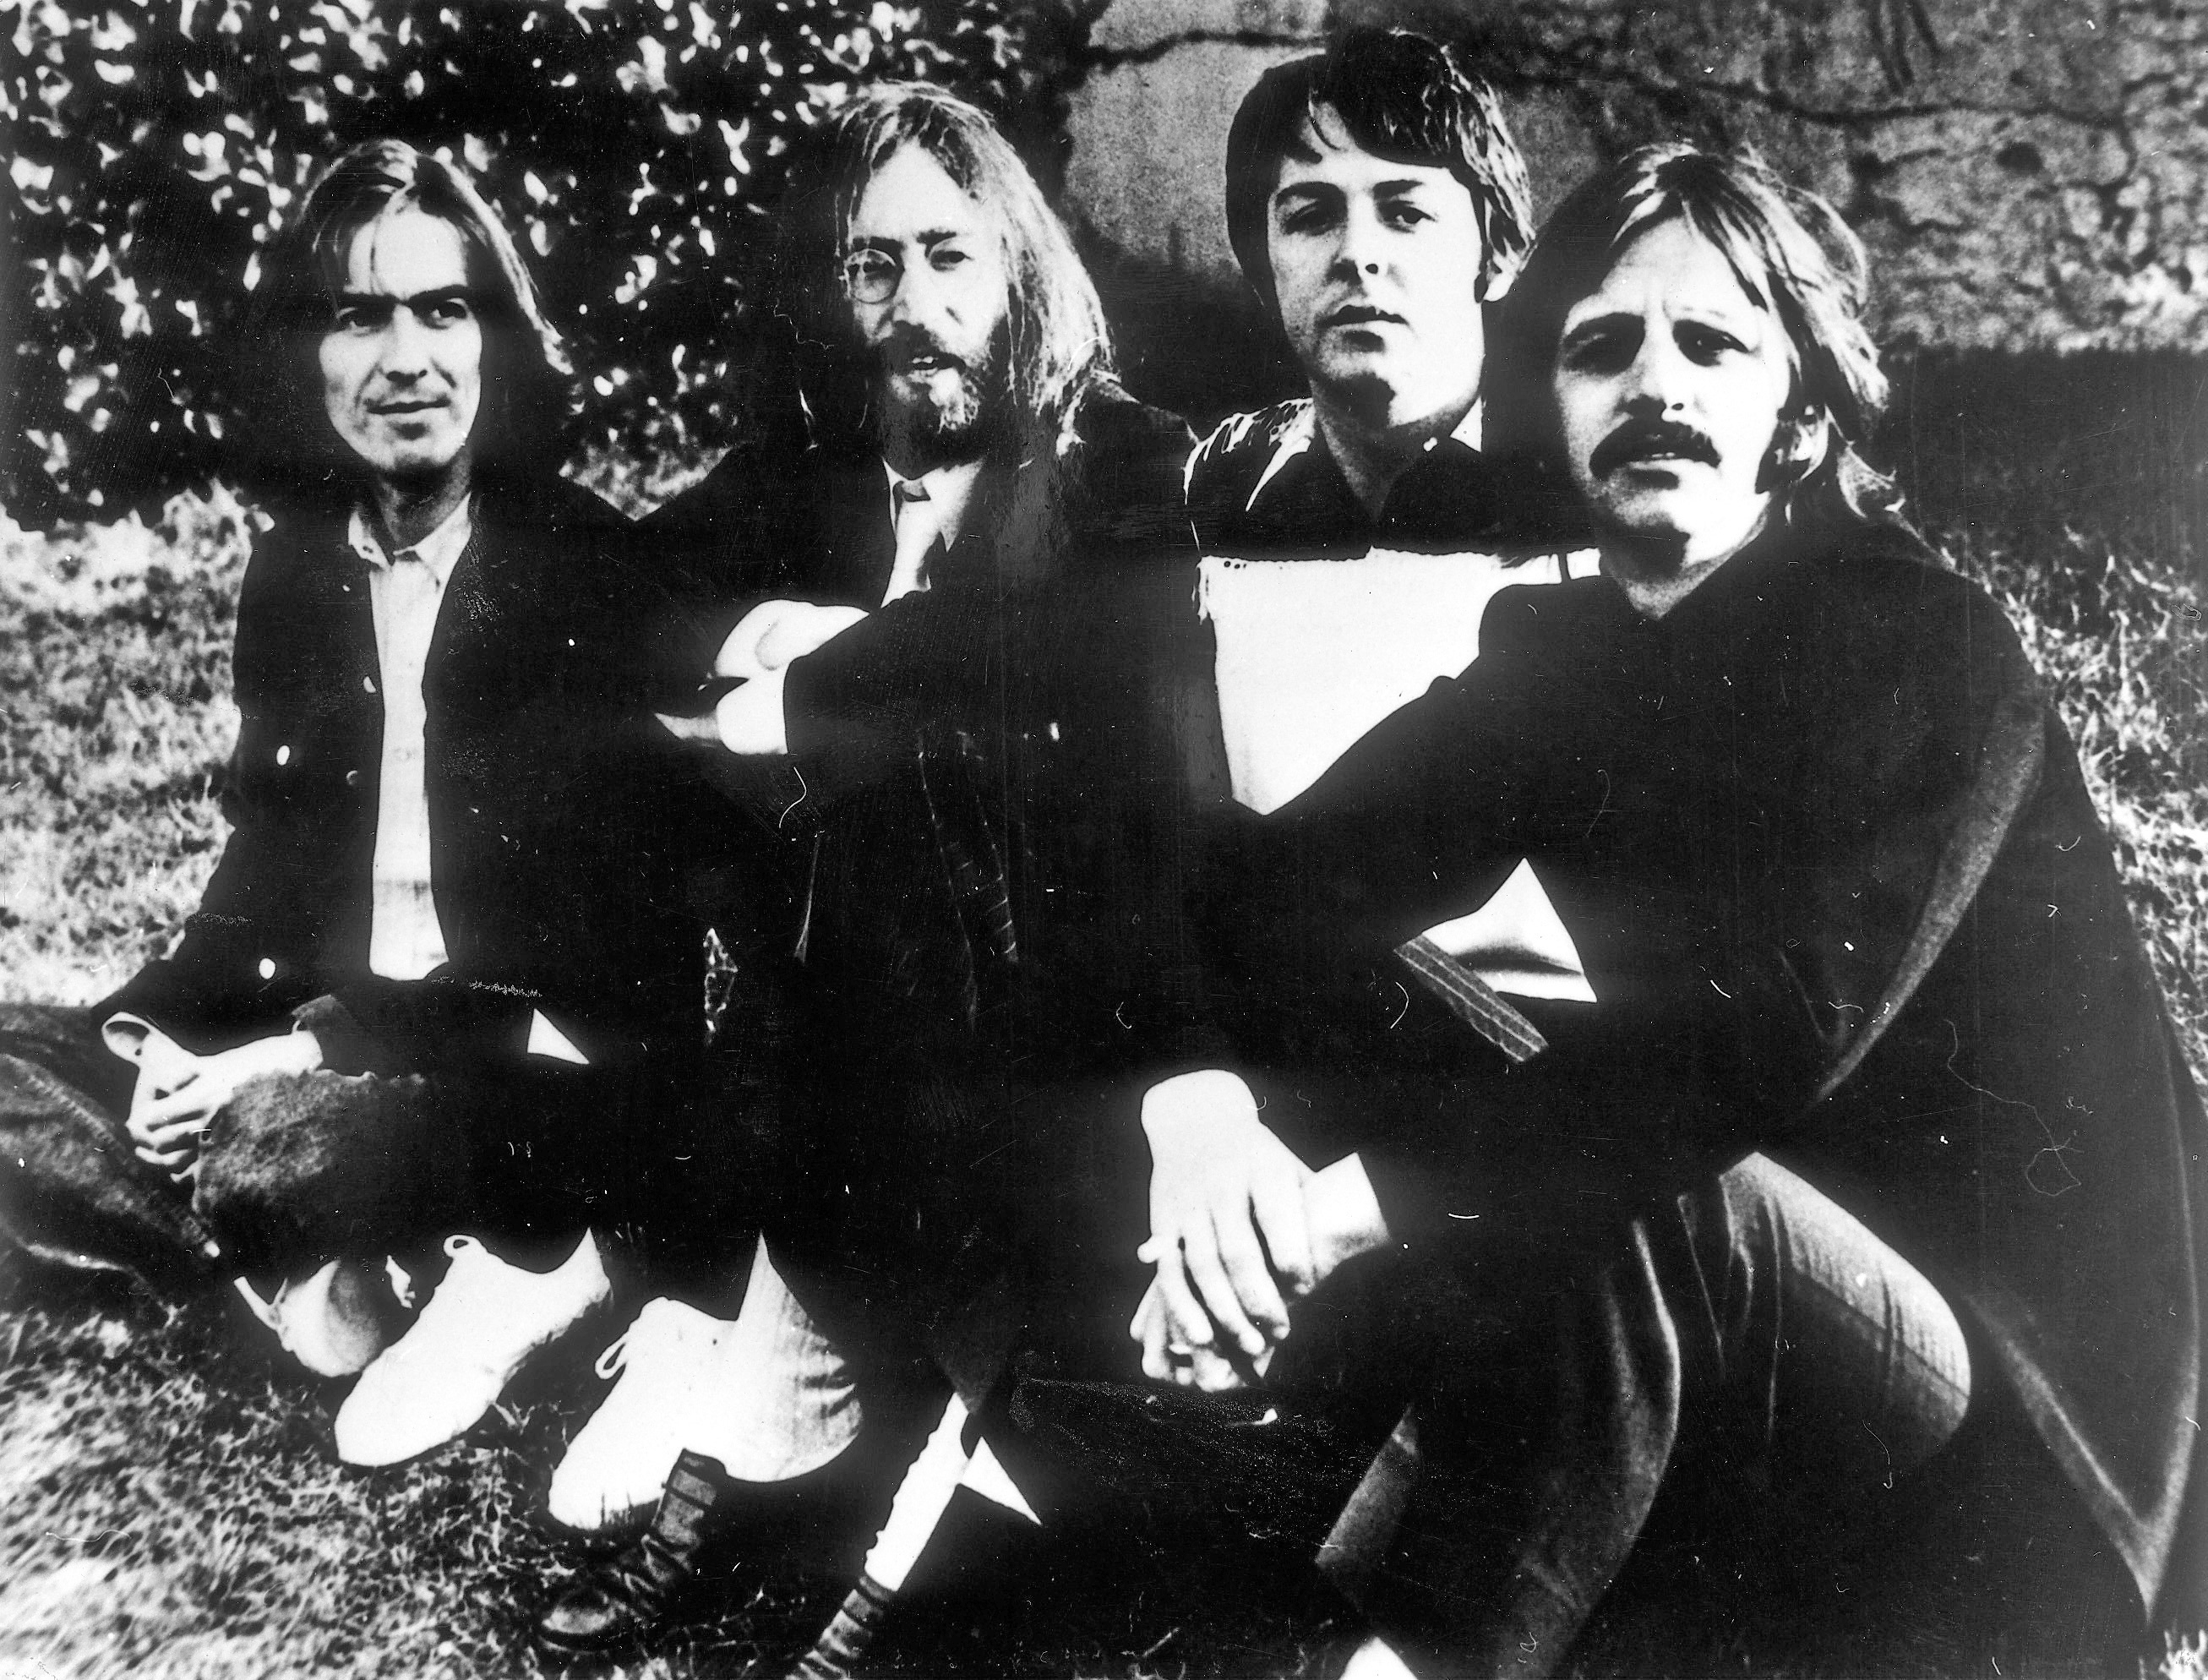 Review: The Beatles' 'White Album'